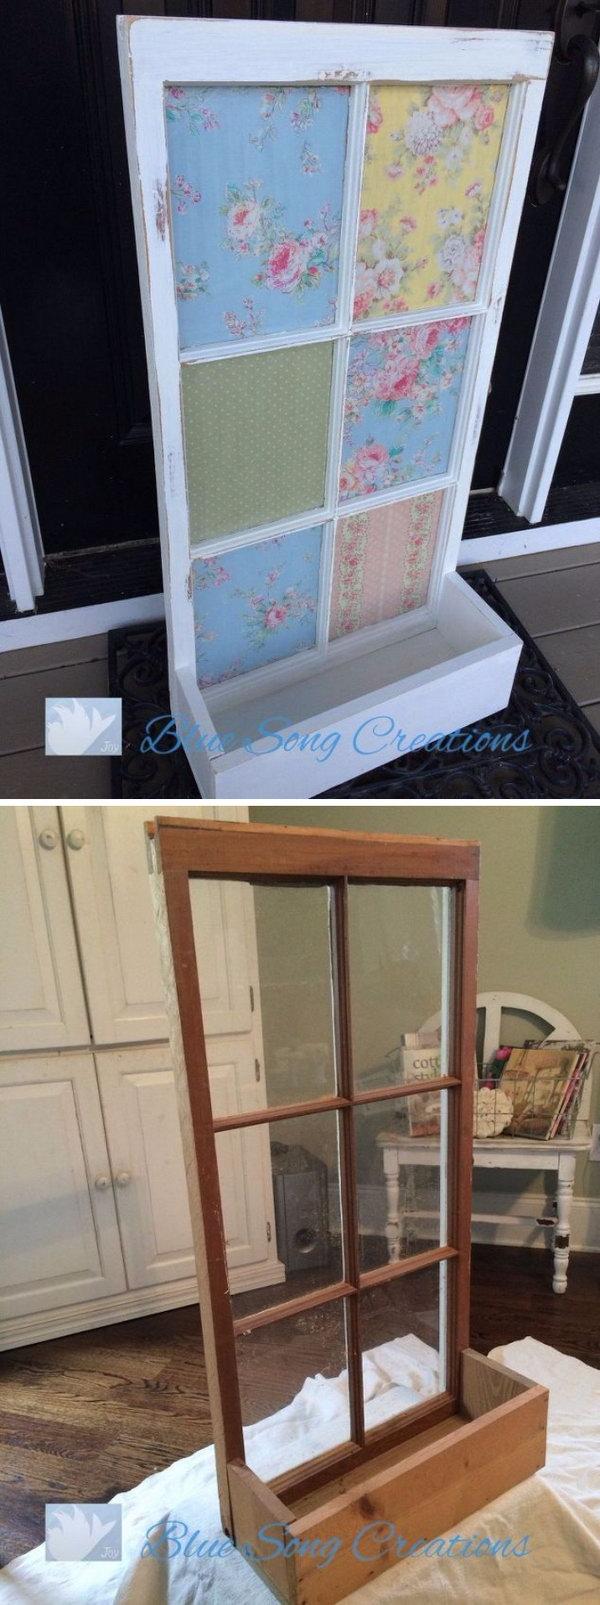 DIY破旧别致的窗框